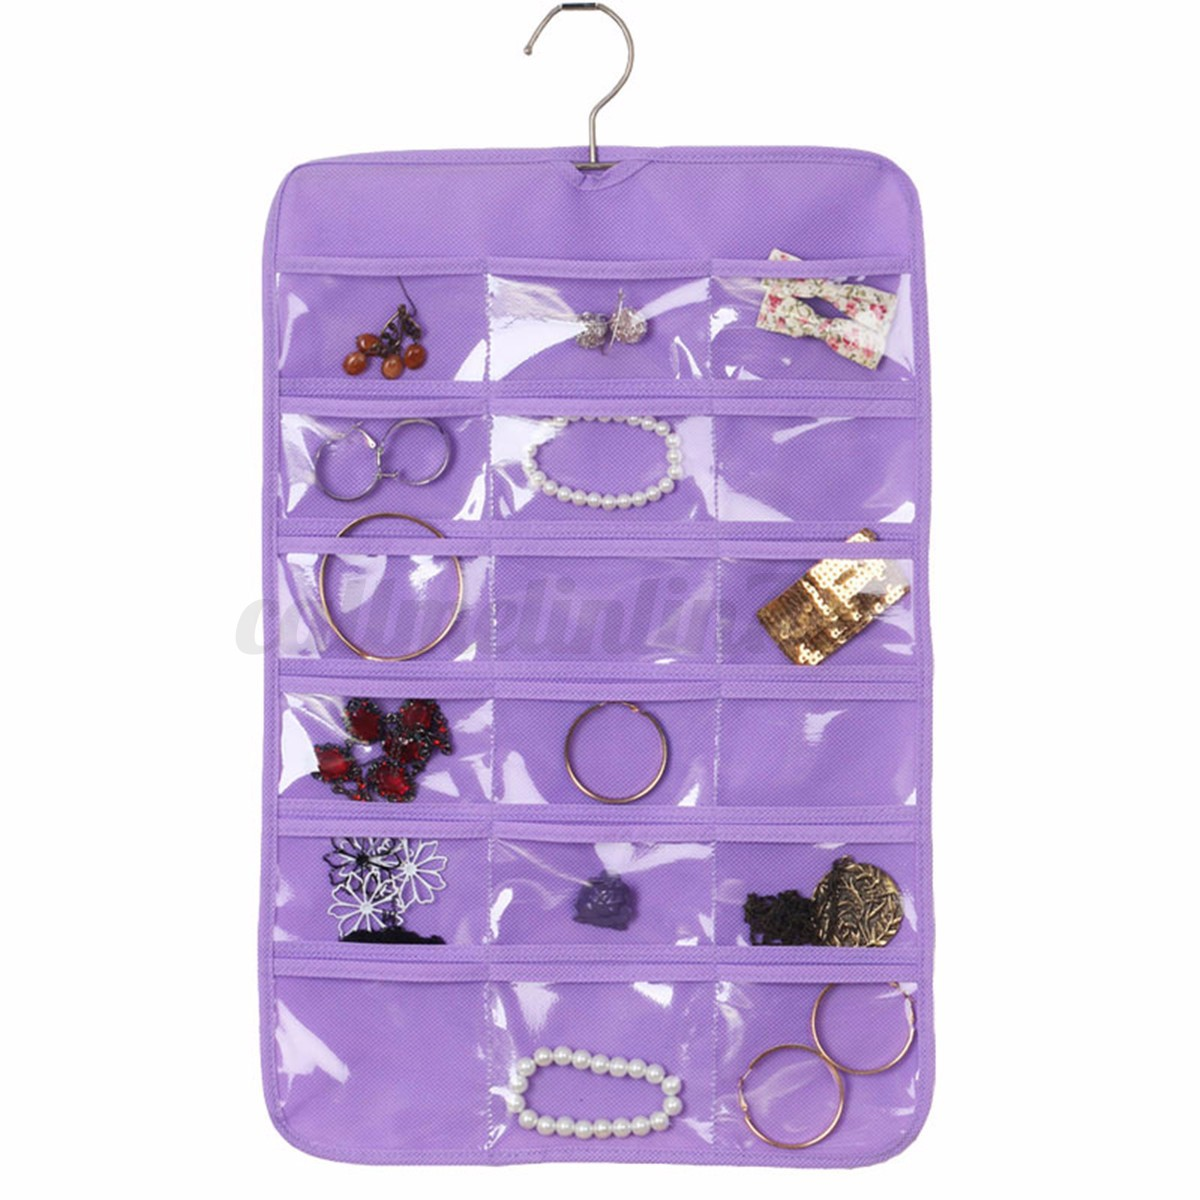 24 pochettes sac de rangement pr sentoir bijoux organisateur mural suspendu ebay. Black Bedroom Furniture Sets. Home Design Ideas